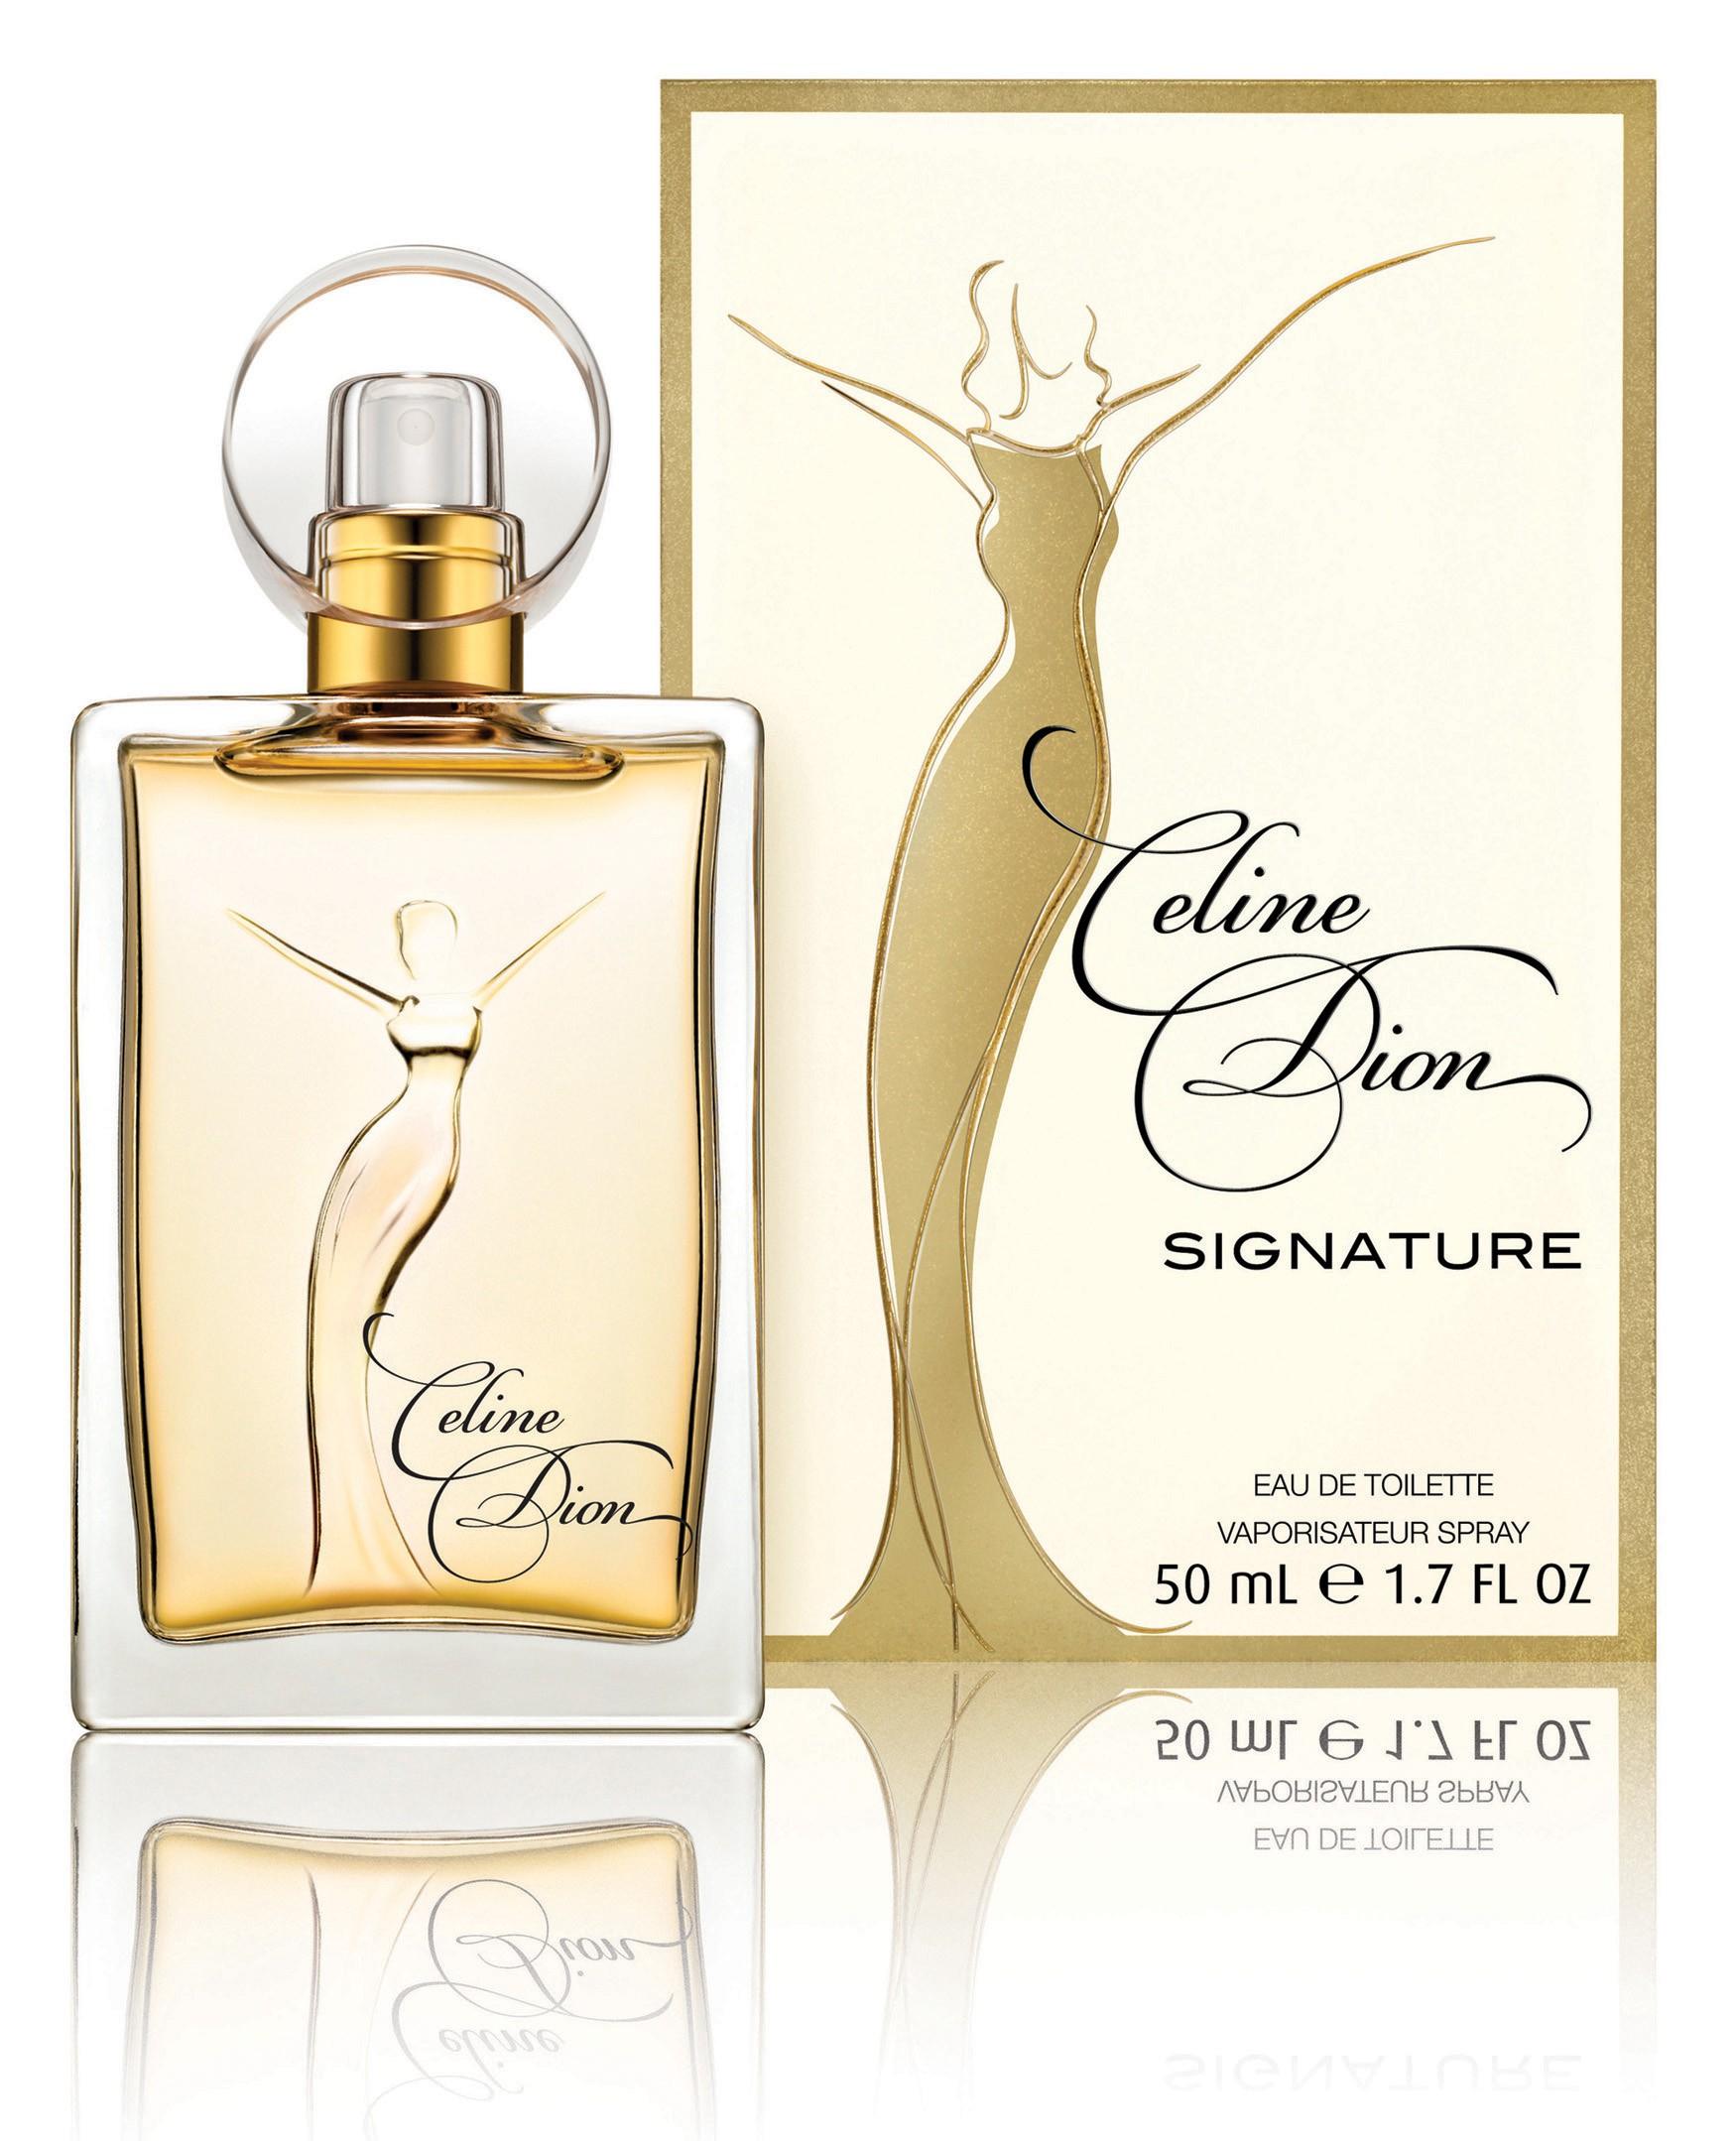 Celine Dion Signature аромат для женщин